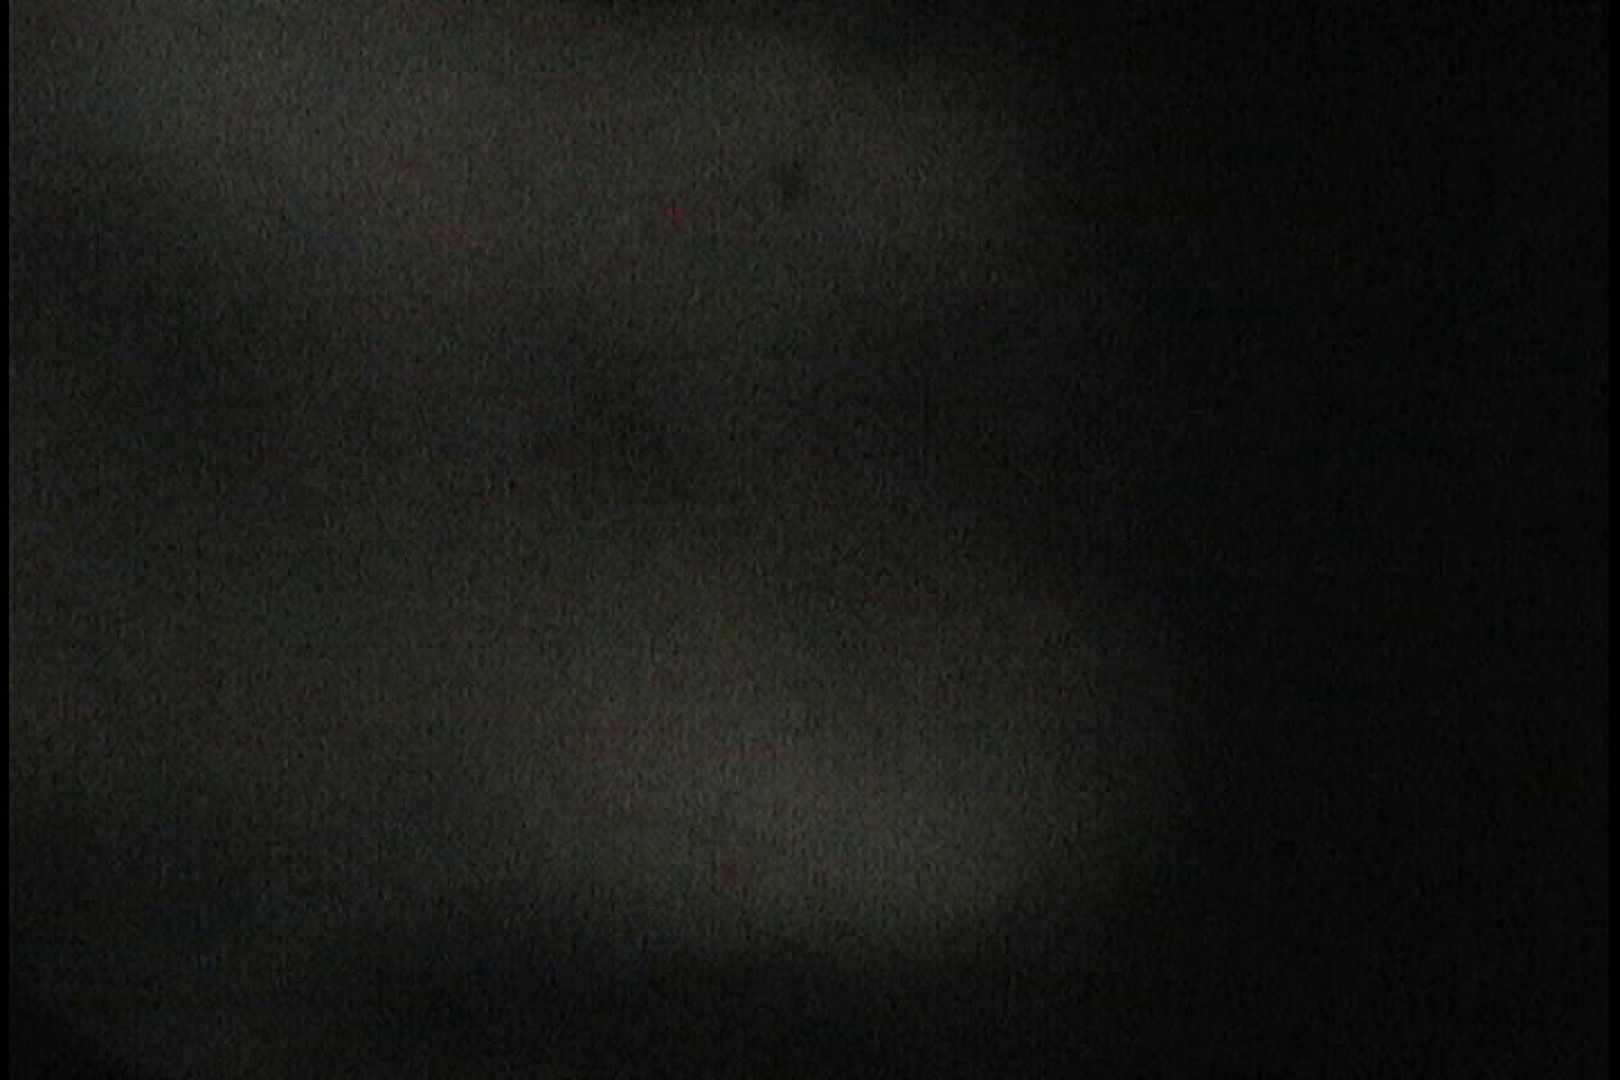 No.68 見事に可愛い巨乳ちゃん 室内暗いです ギャル達 オマンコ無修正動画無料 79枚 58